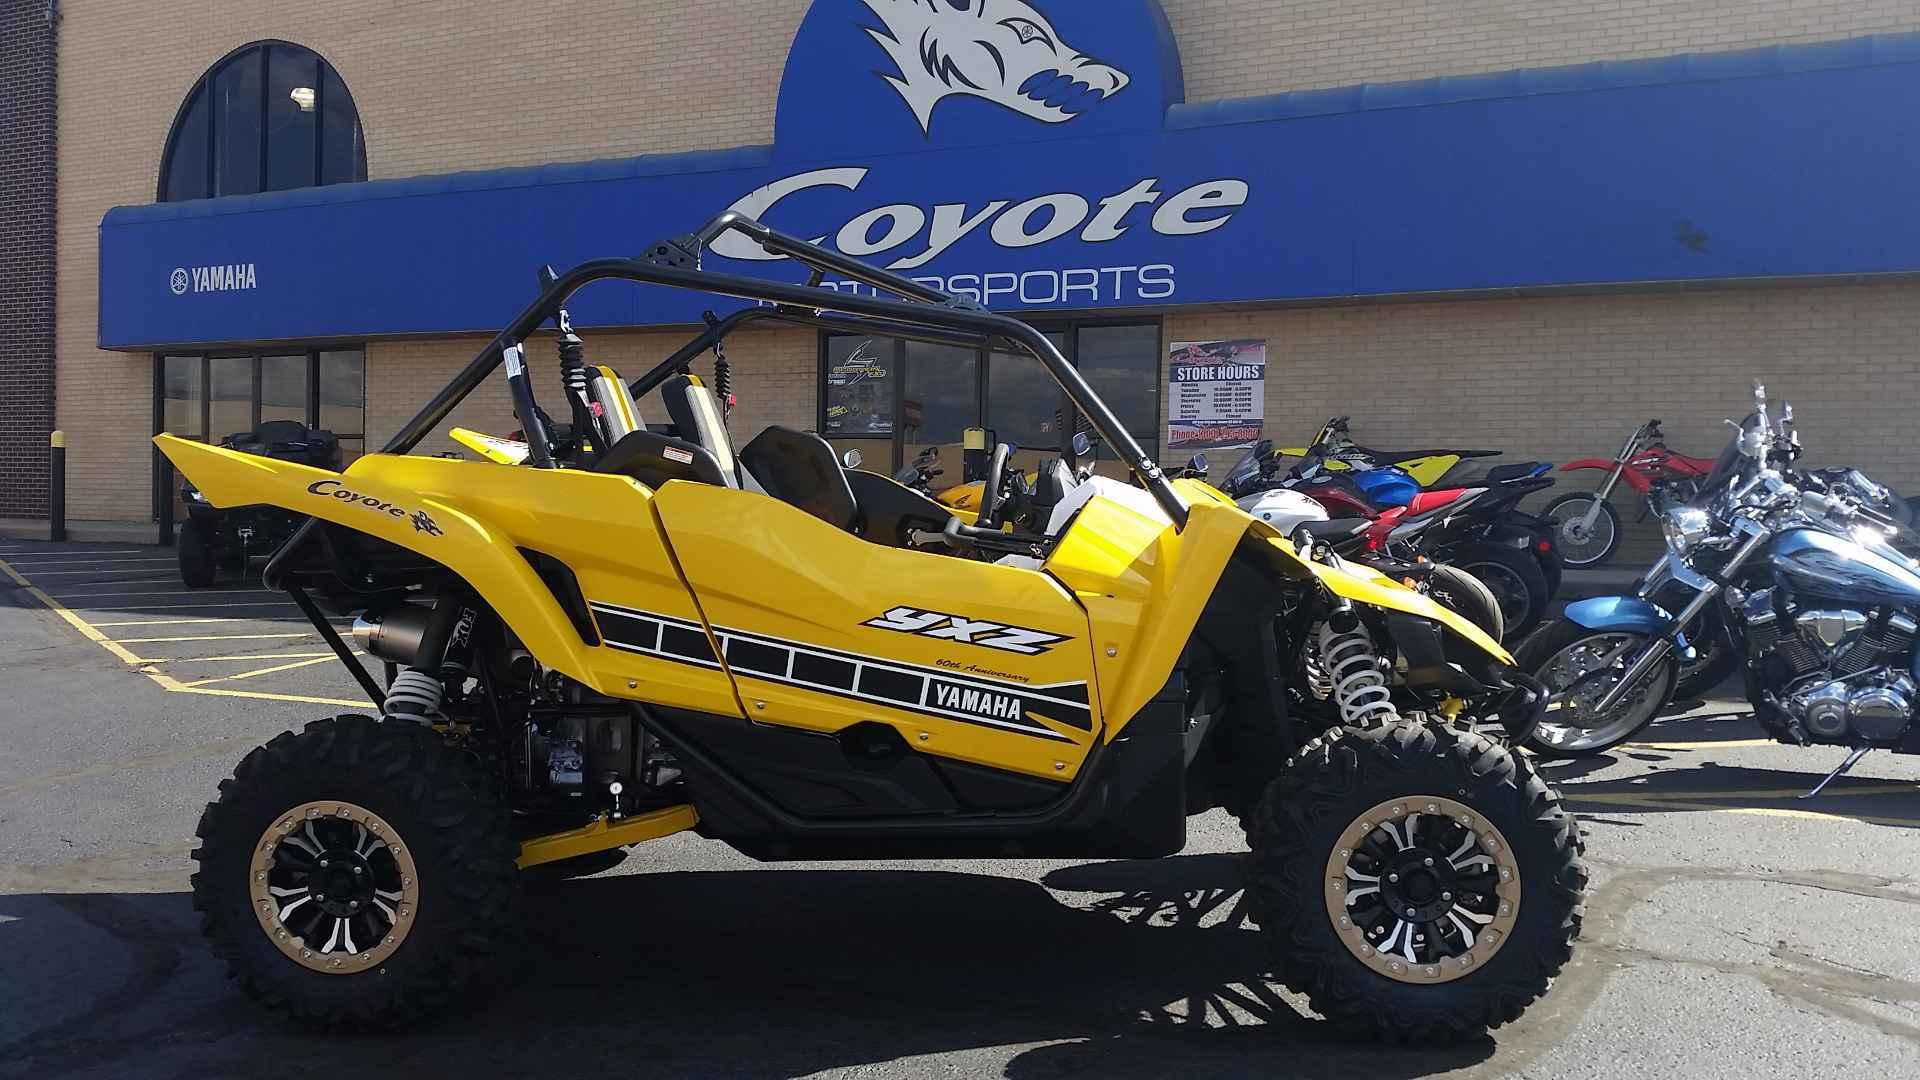 New 2016 yamaha yxz1000r se atvs for sale in colorado on for New york yamaha honda